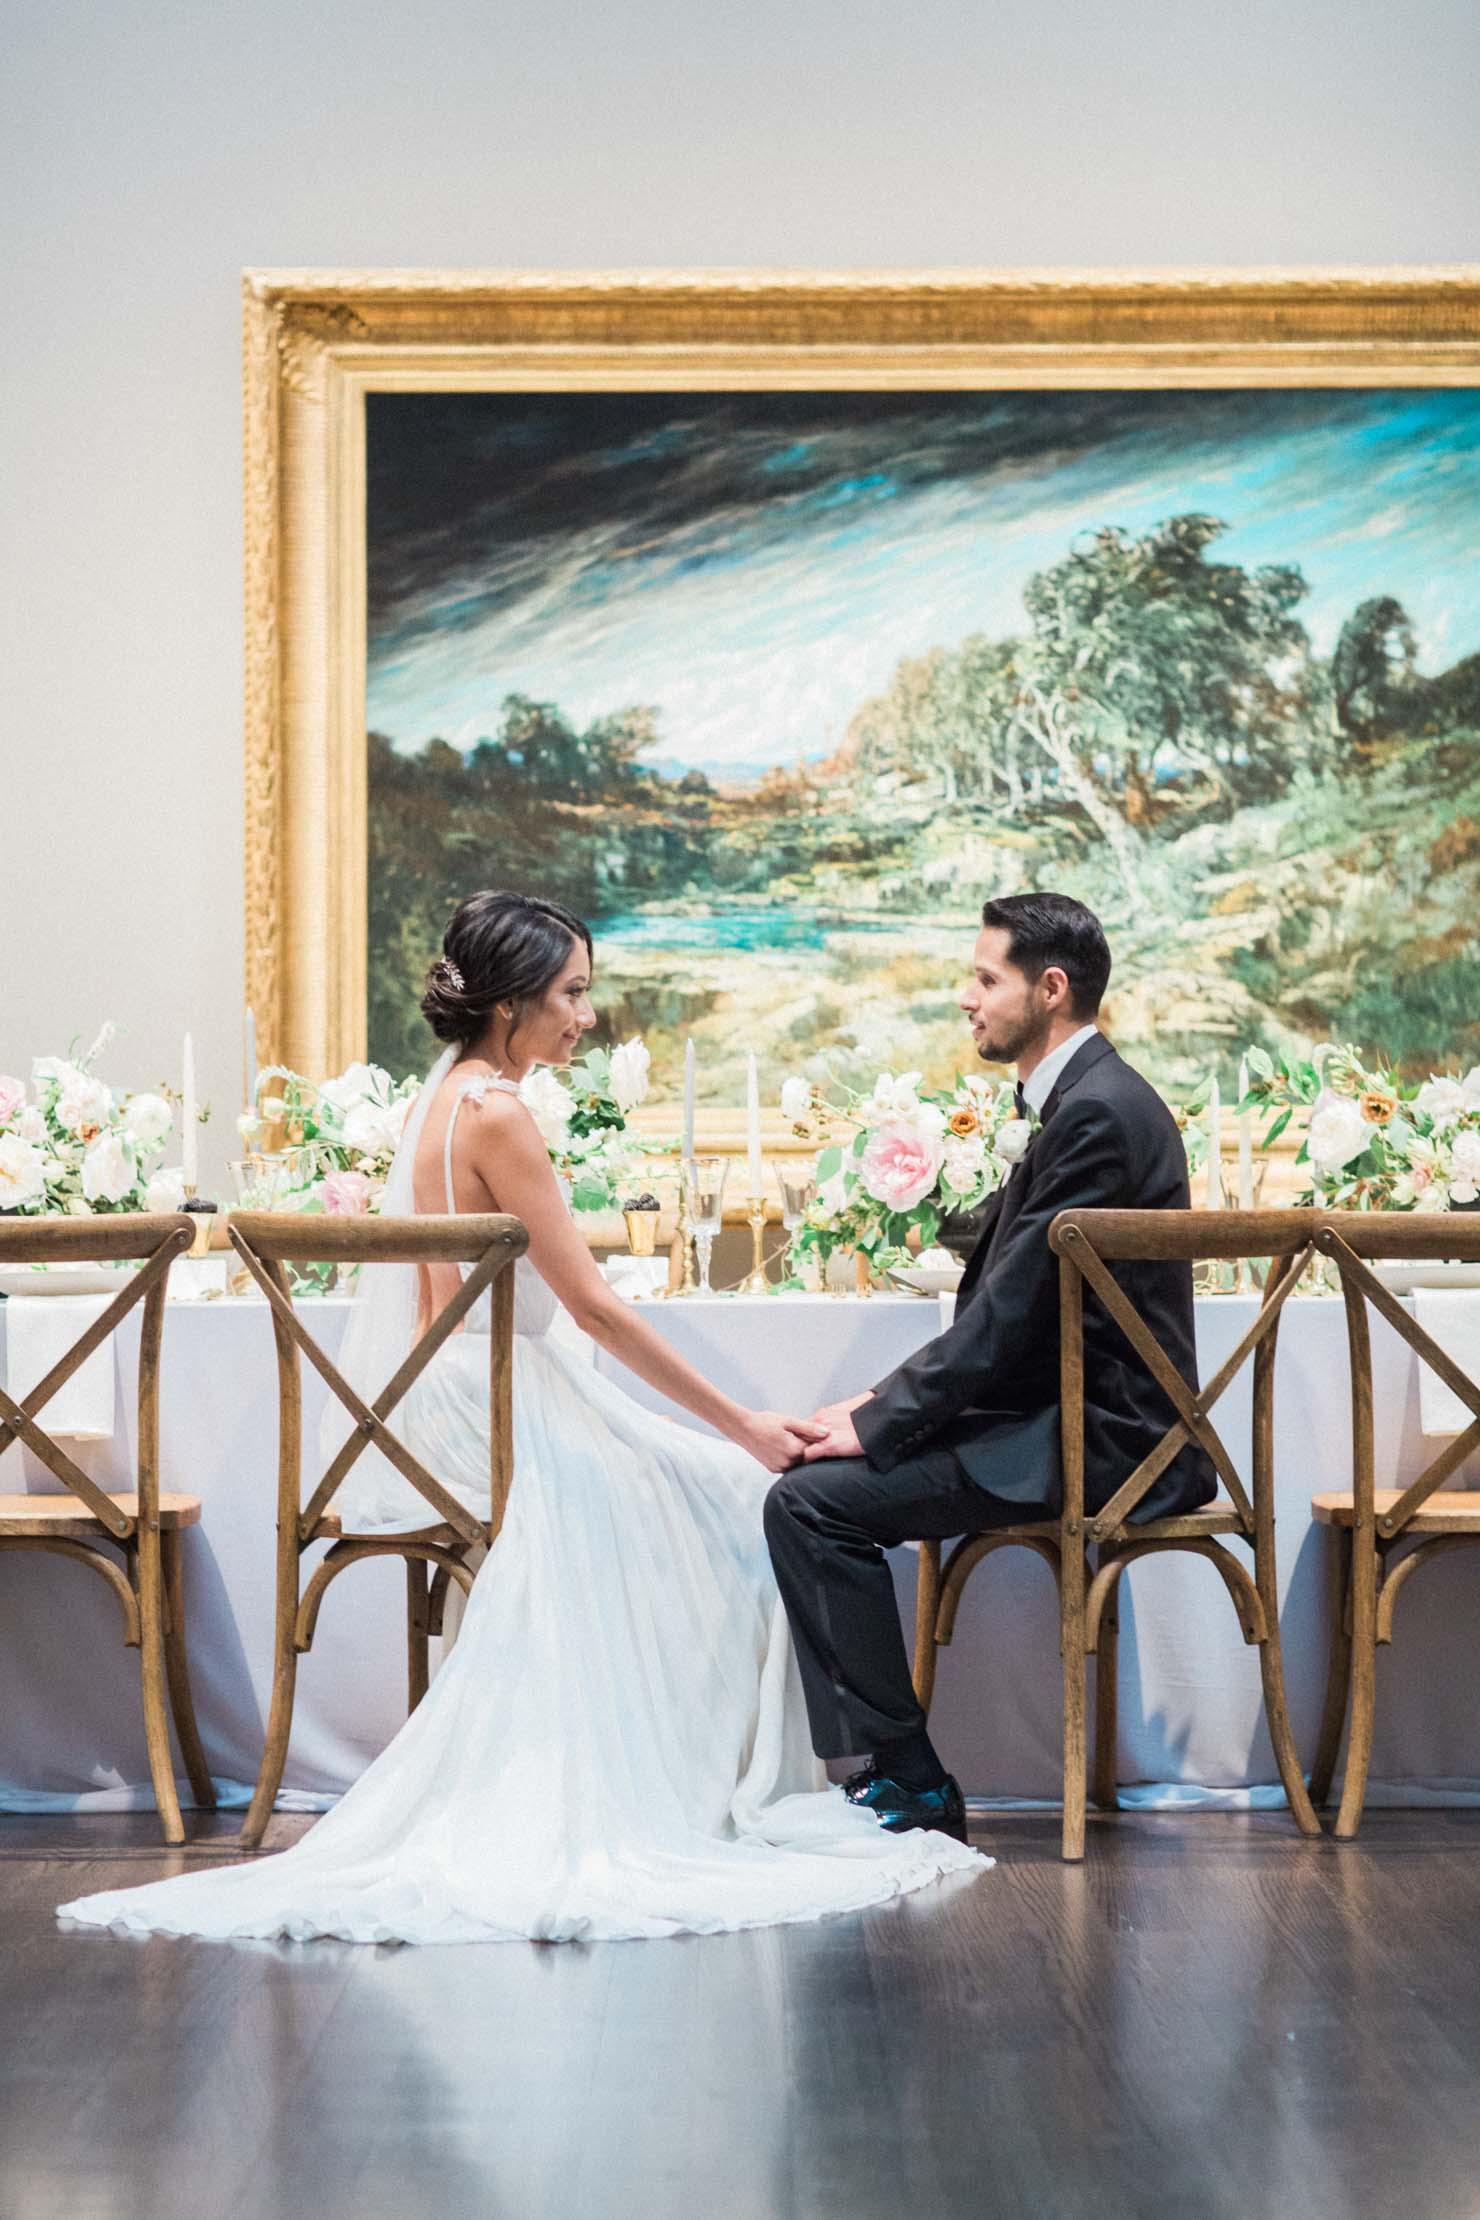 Lilly Beltran of Daily Craving blog & husband Erick celebrate 10 year wedding anniversary